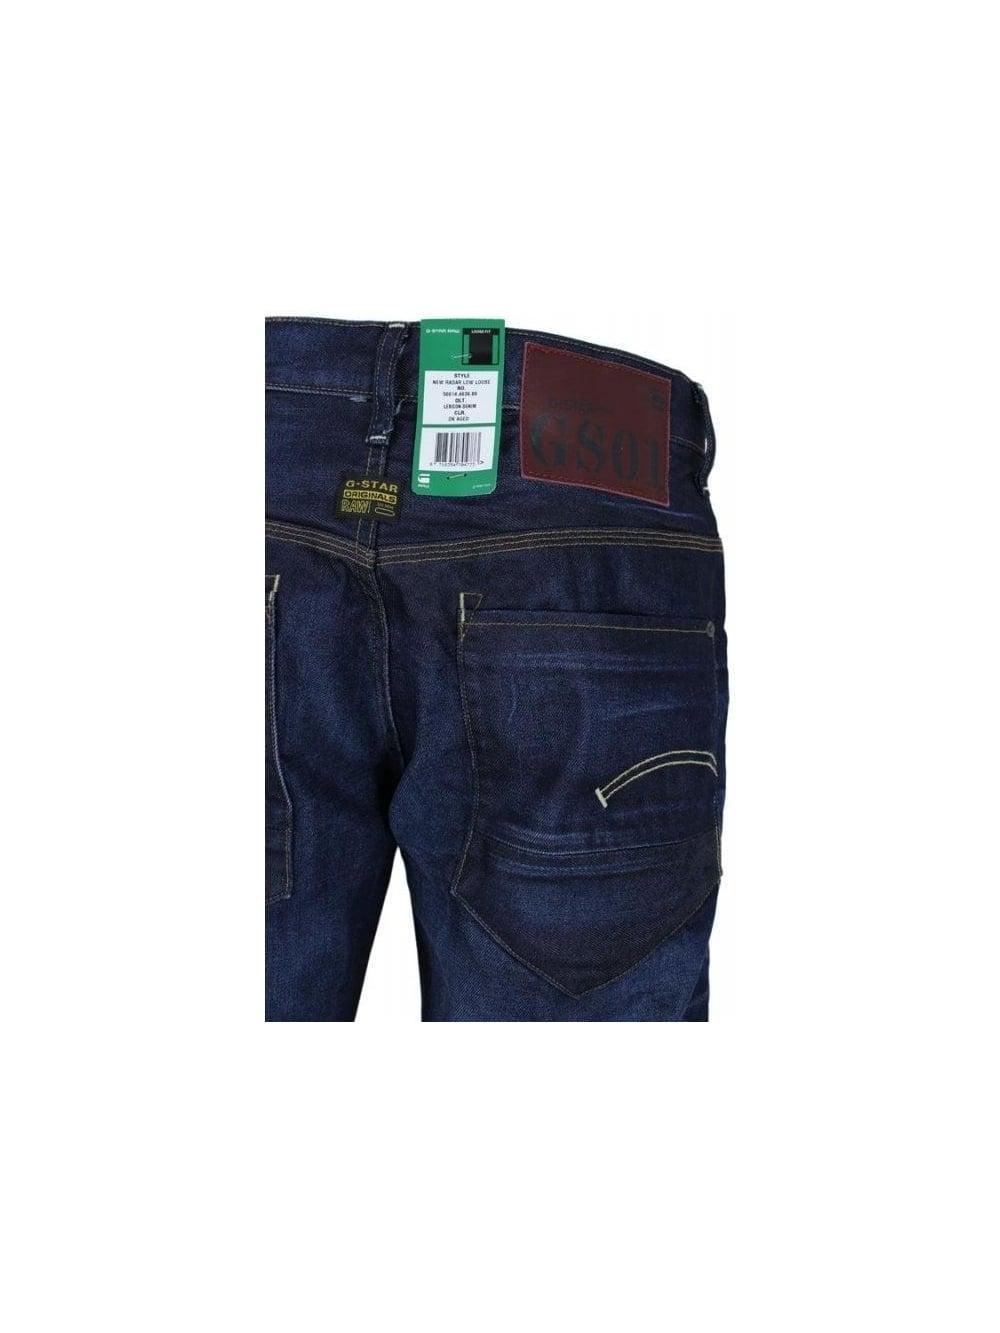 f709ba26a80 G Star New Radar Low Loose Jeans in Dark Aged - Northern Threads